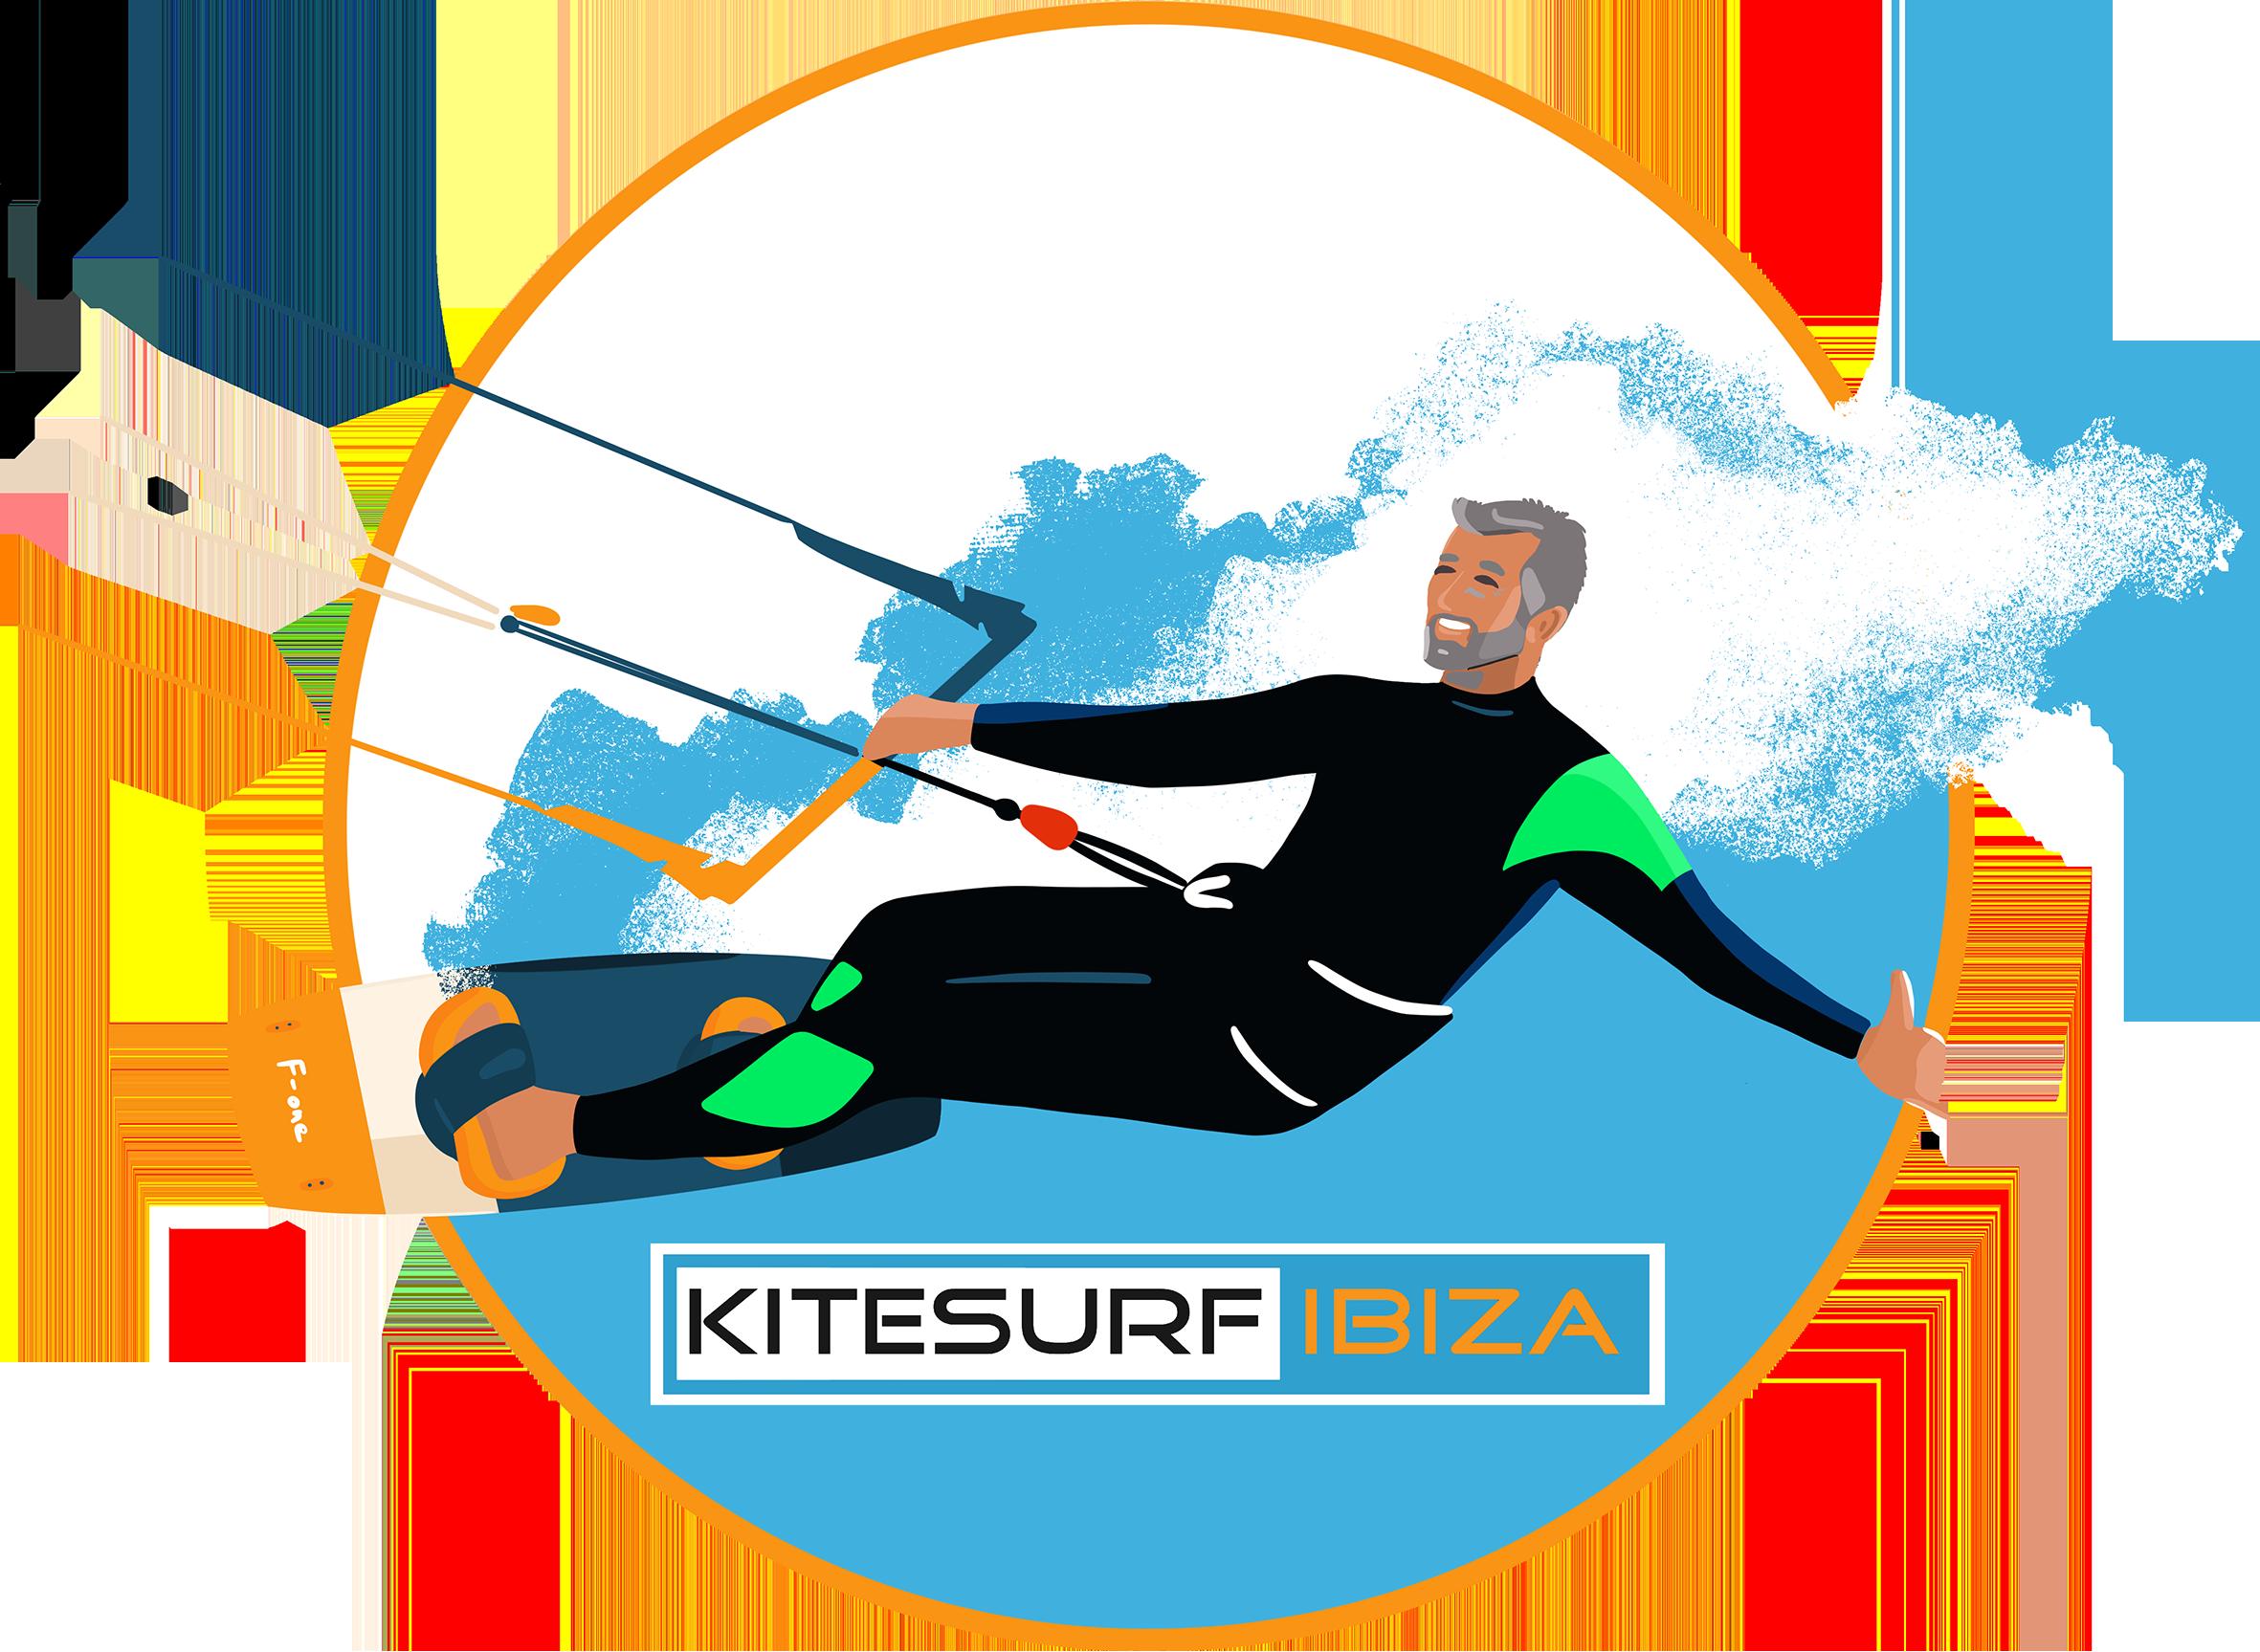 Kitesurf Ibiza